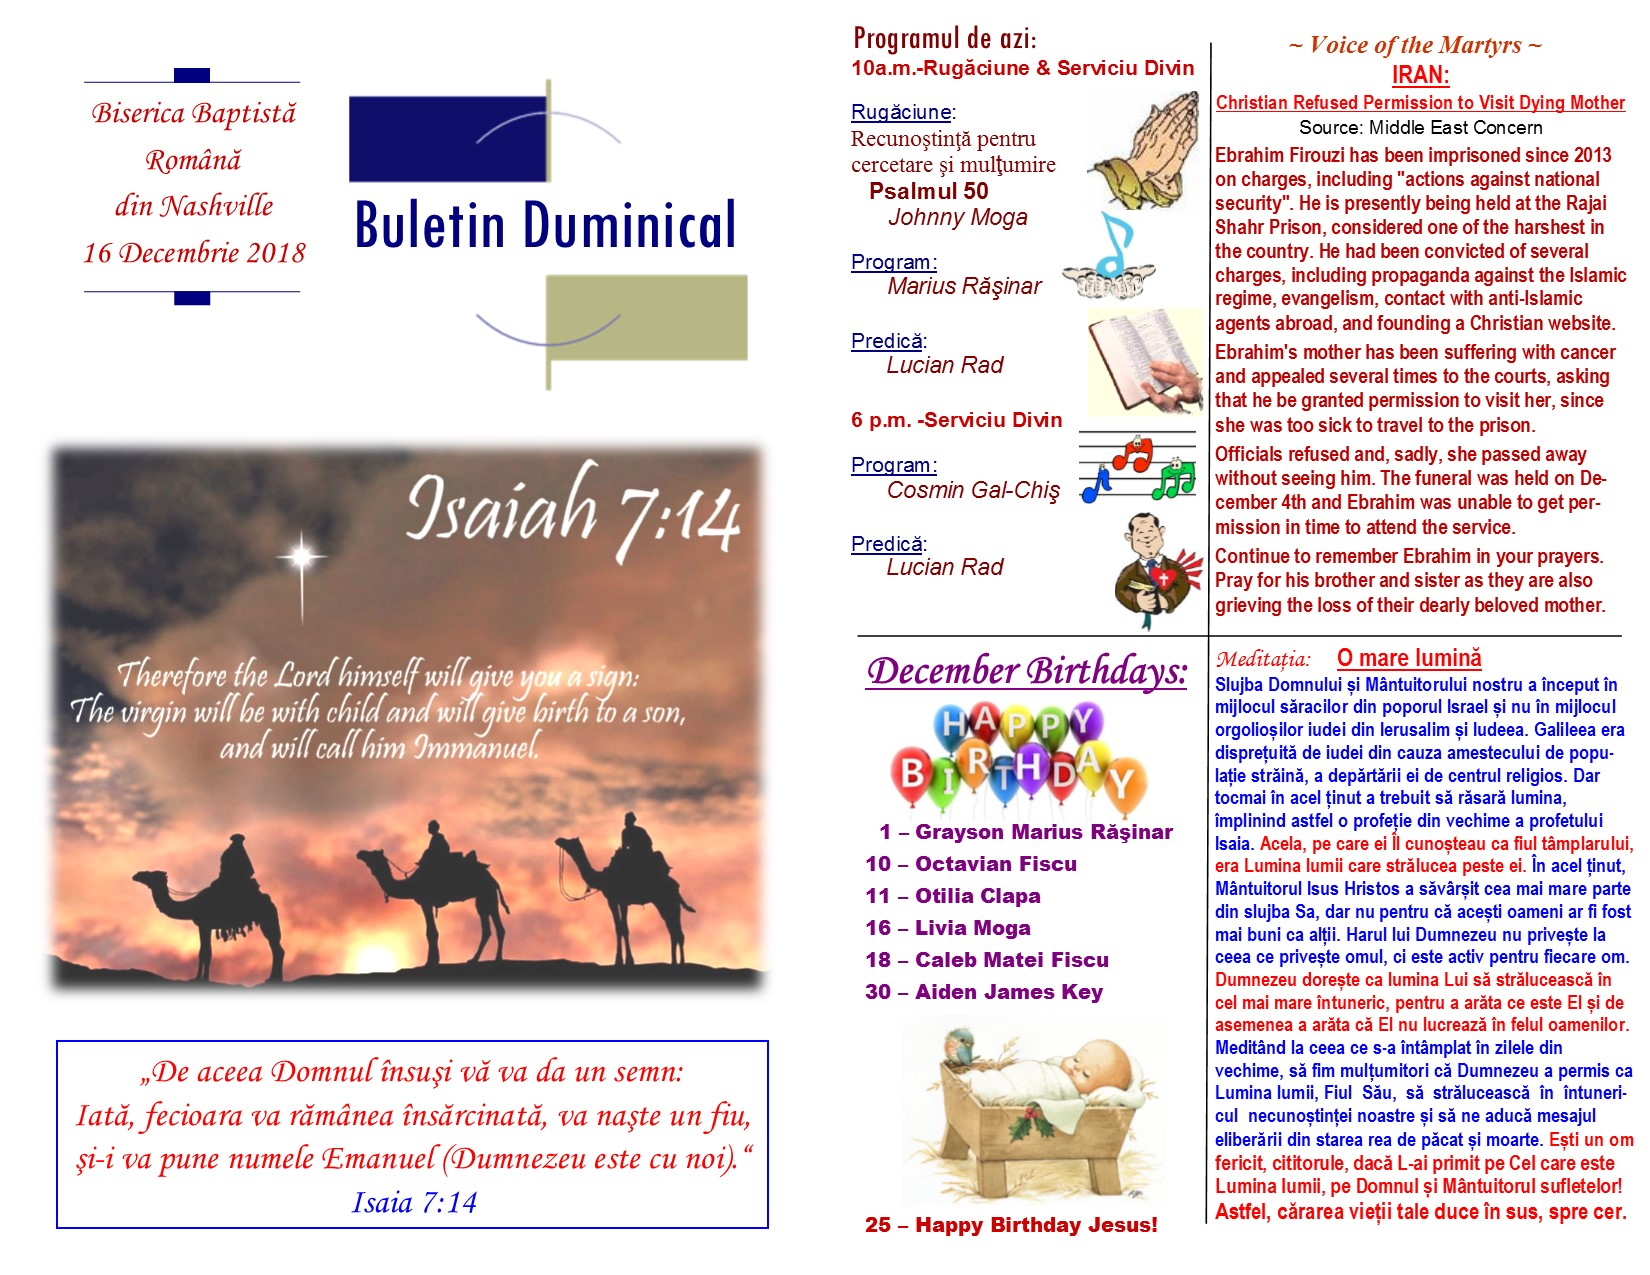 Buletin 12-16-18 page 1 & 2